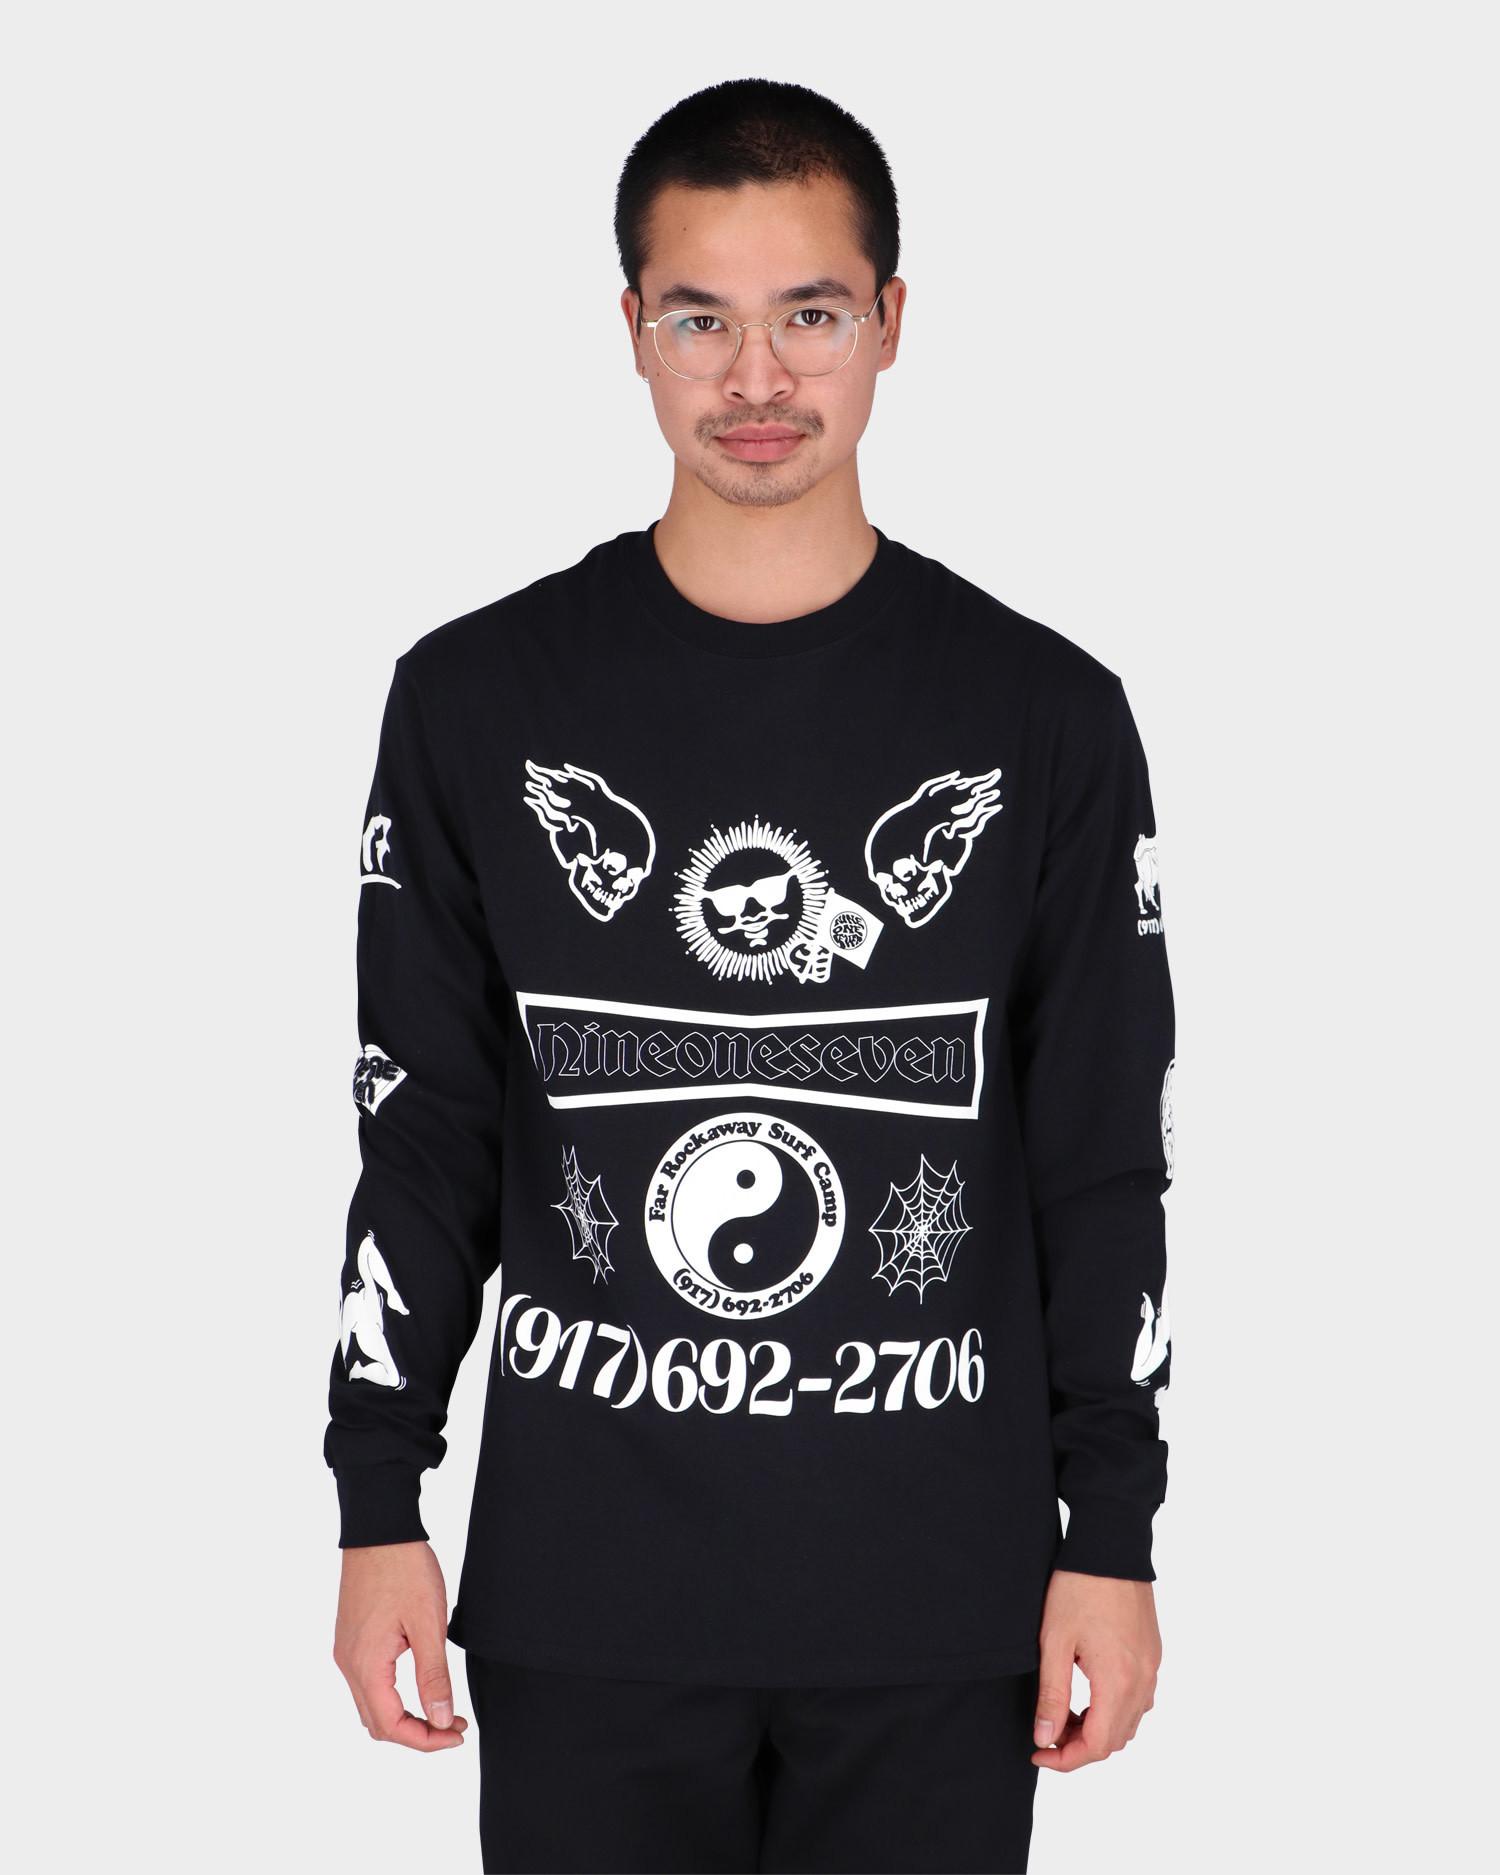 Call me 917 Collage Black Longsleeve T-Shirt Black